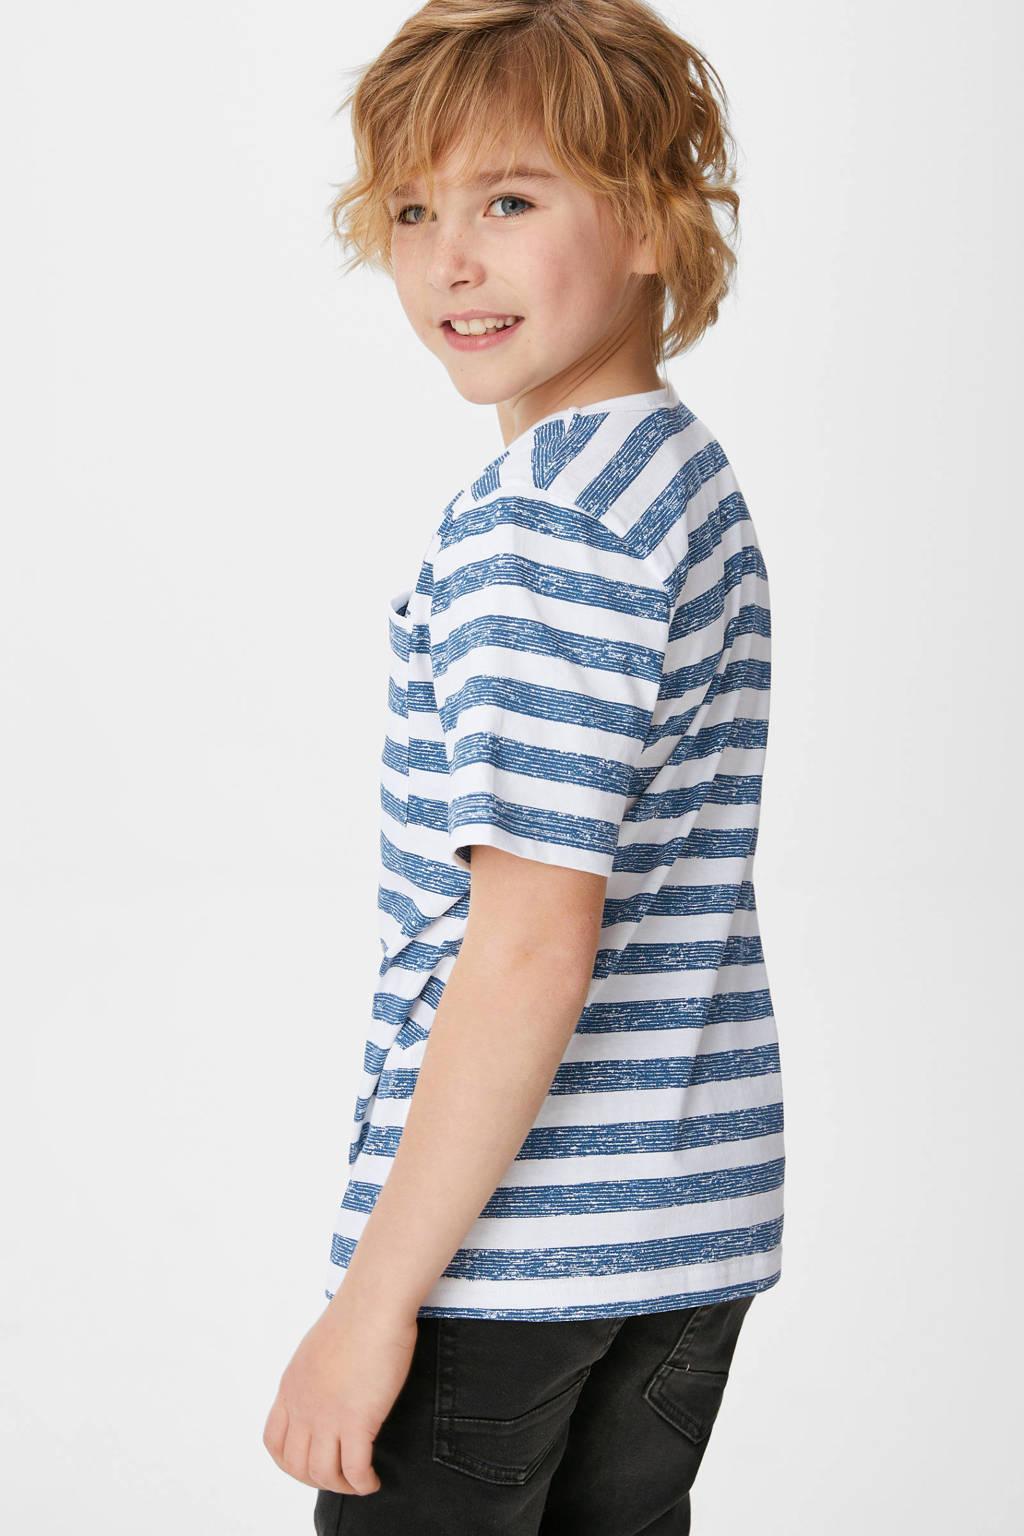 C&A T-shirt - set van 2 blauw/donkerblauw/wit, Blauw/donkerblauw/wit